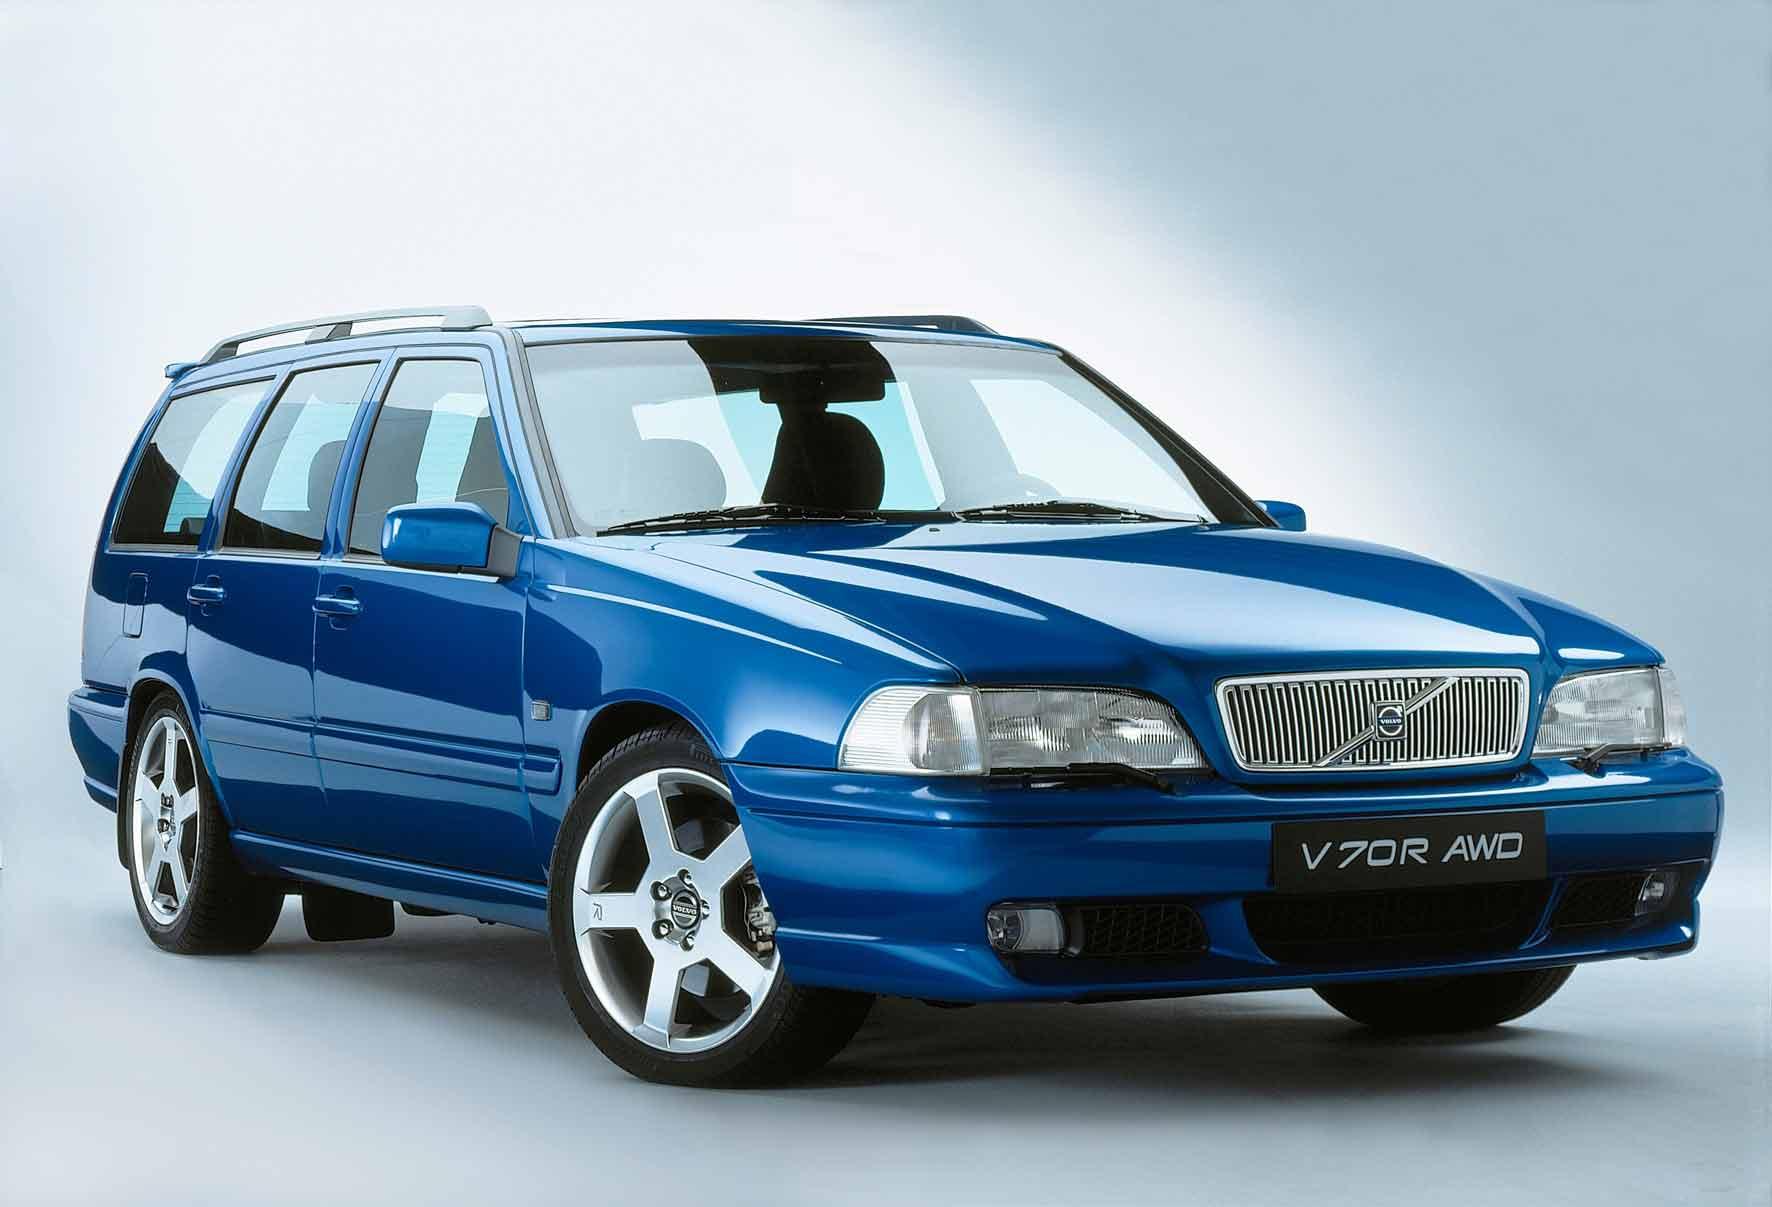 Volvo V70 R Awd - Laser Blue